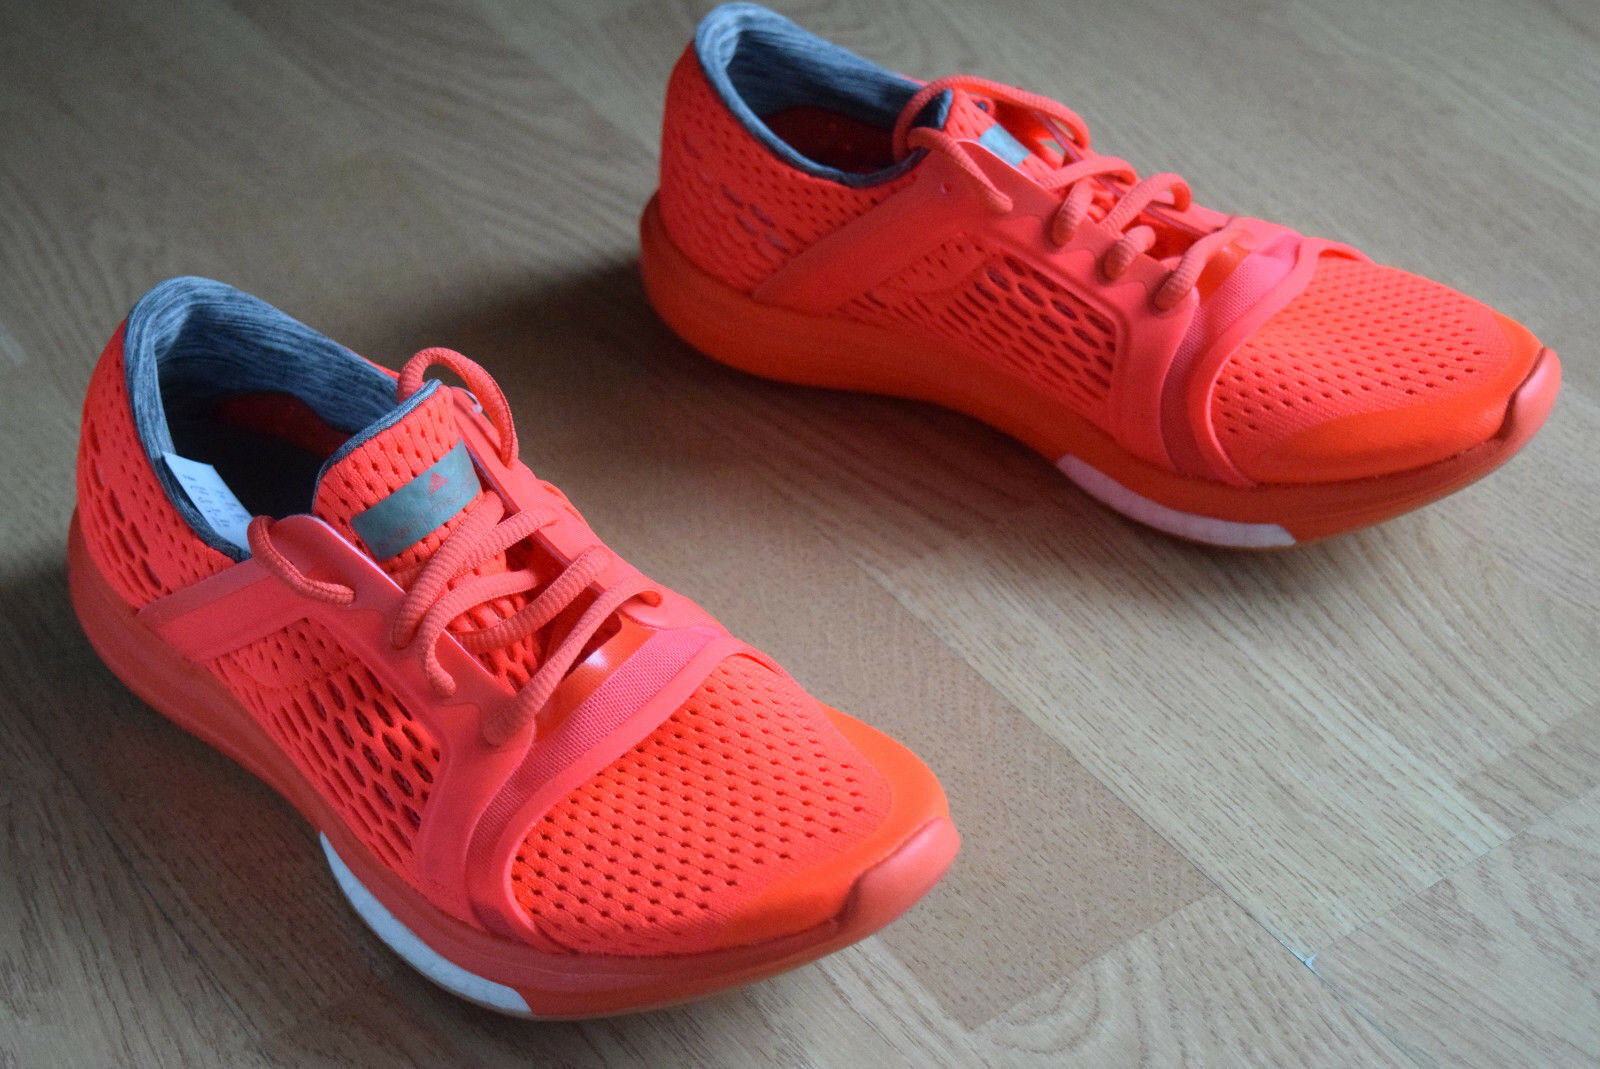 Adidas Stella McAutotney CC Sonic Boost 37 38 39 40 41 Clima Cool B2515 Rita Ora